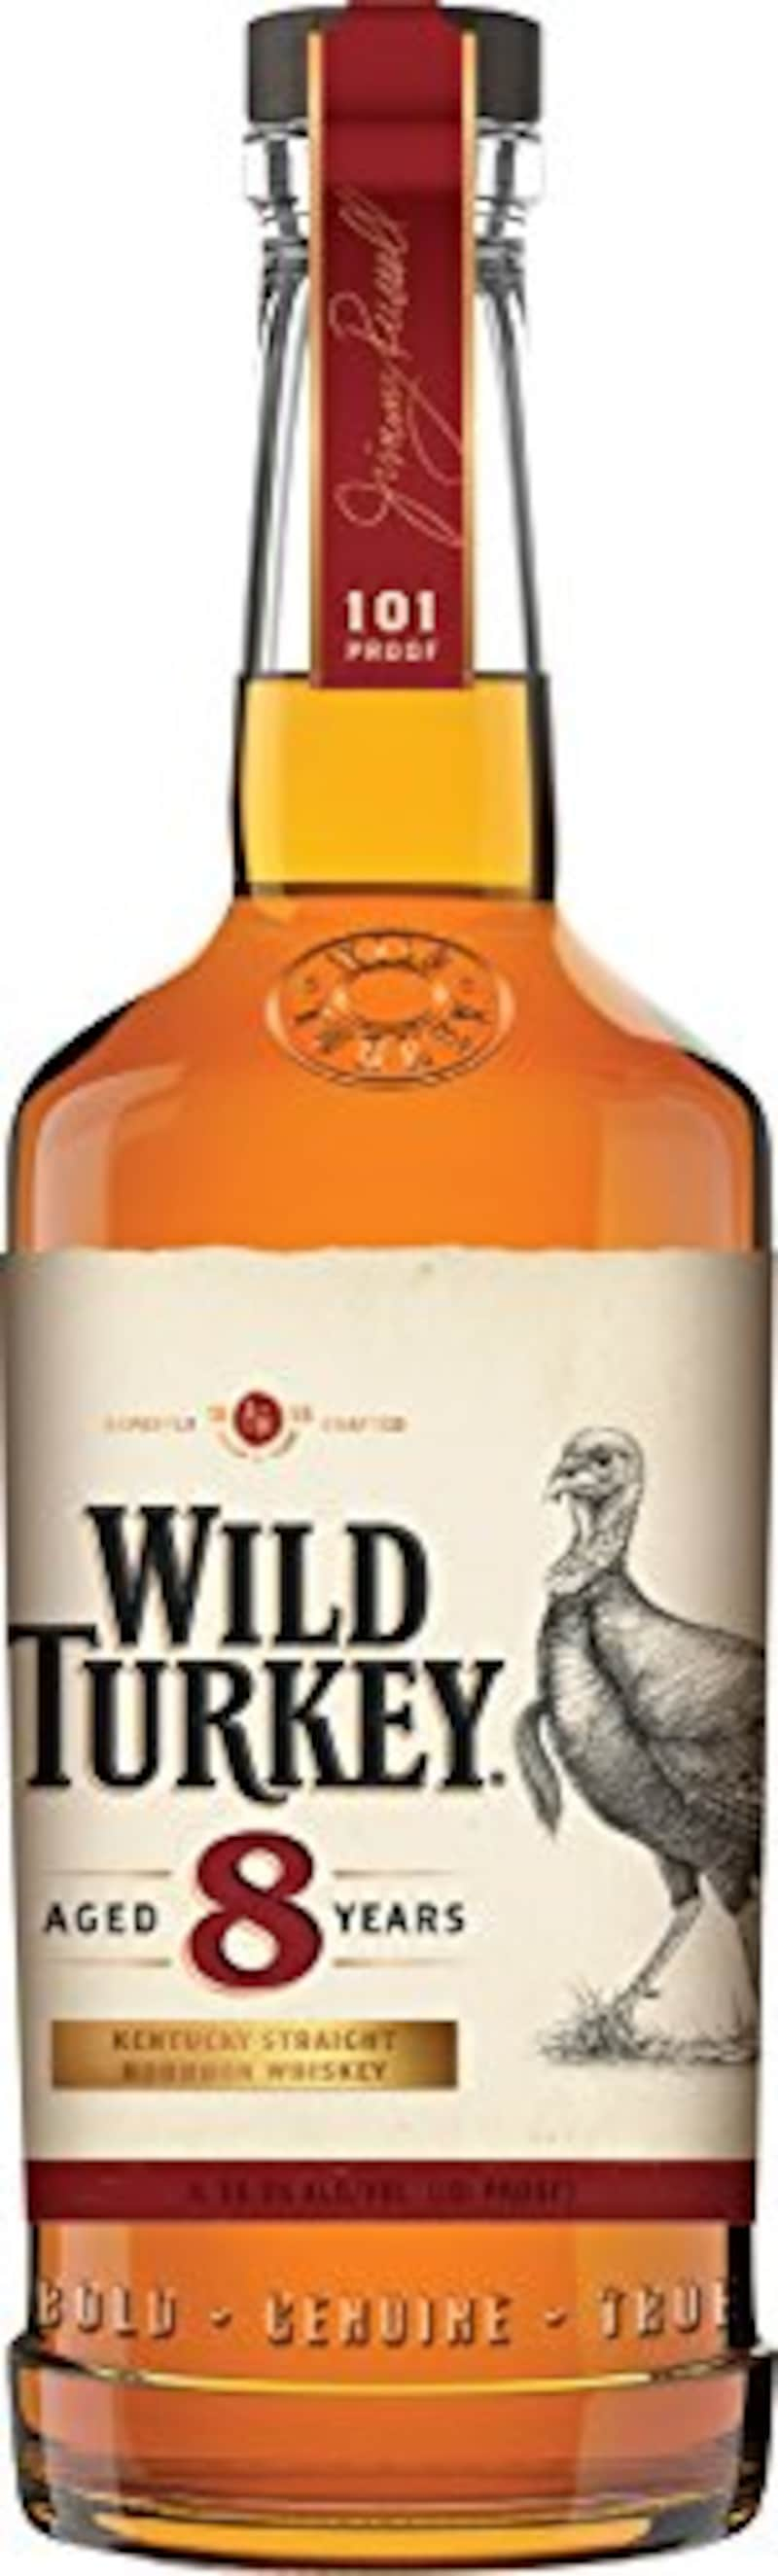 WILD TURKEY (ワイルドターキー),ワイルドターキー8年,-